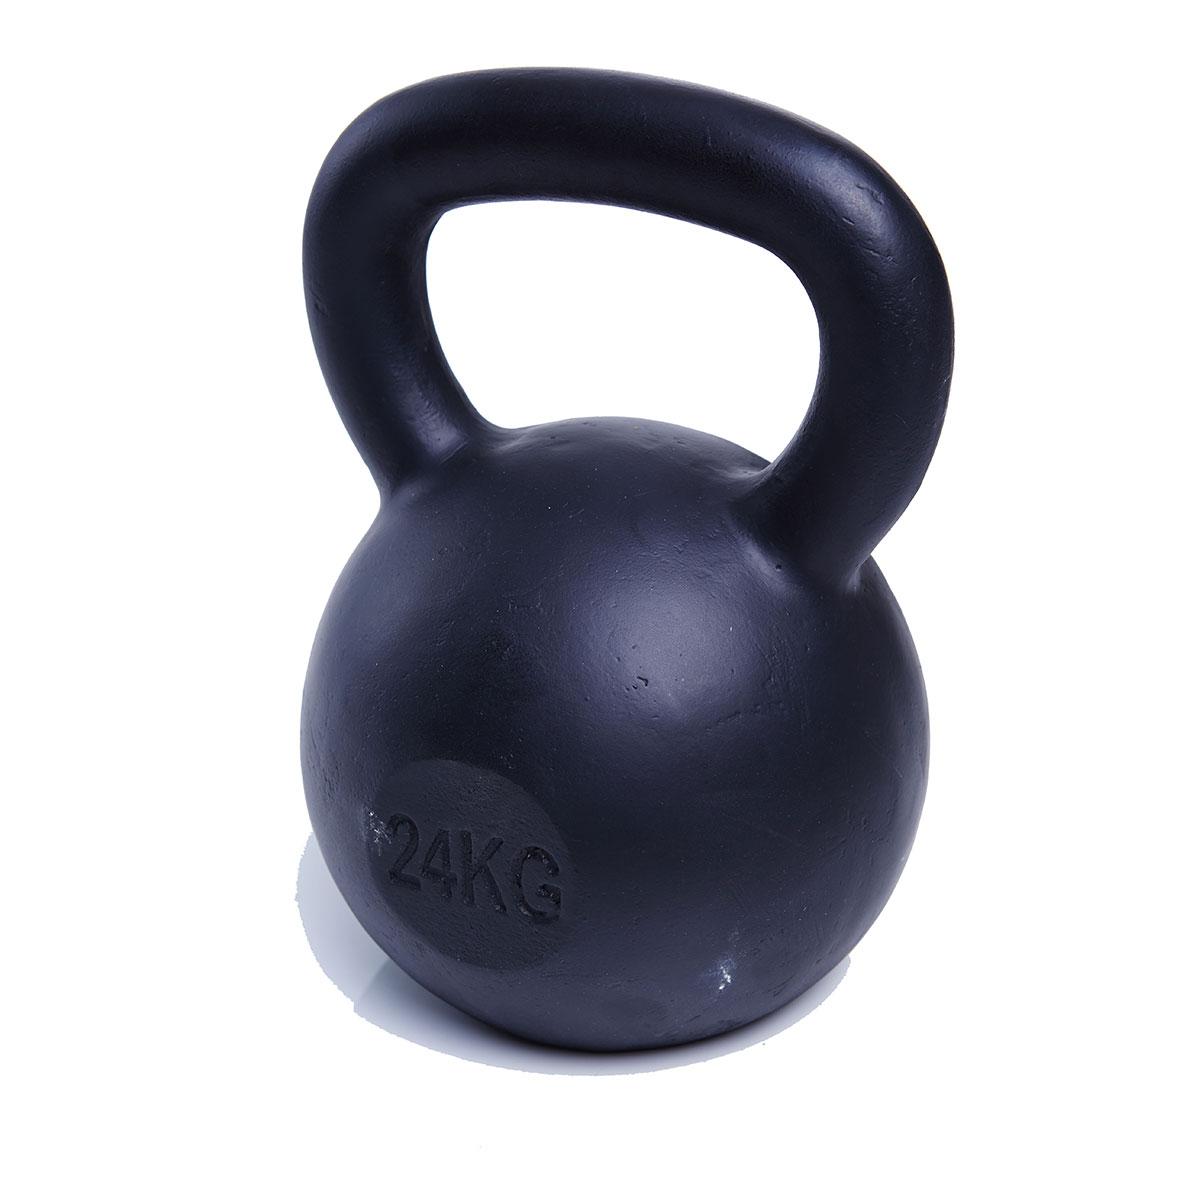 Kettlebell 24kg Wellness